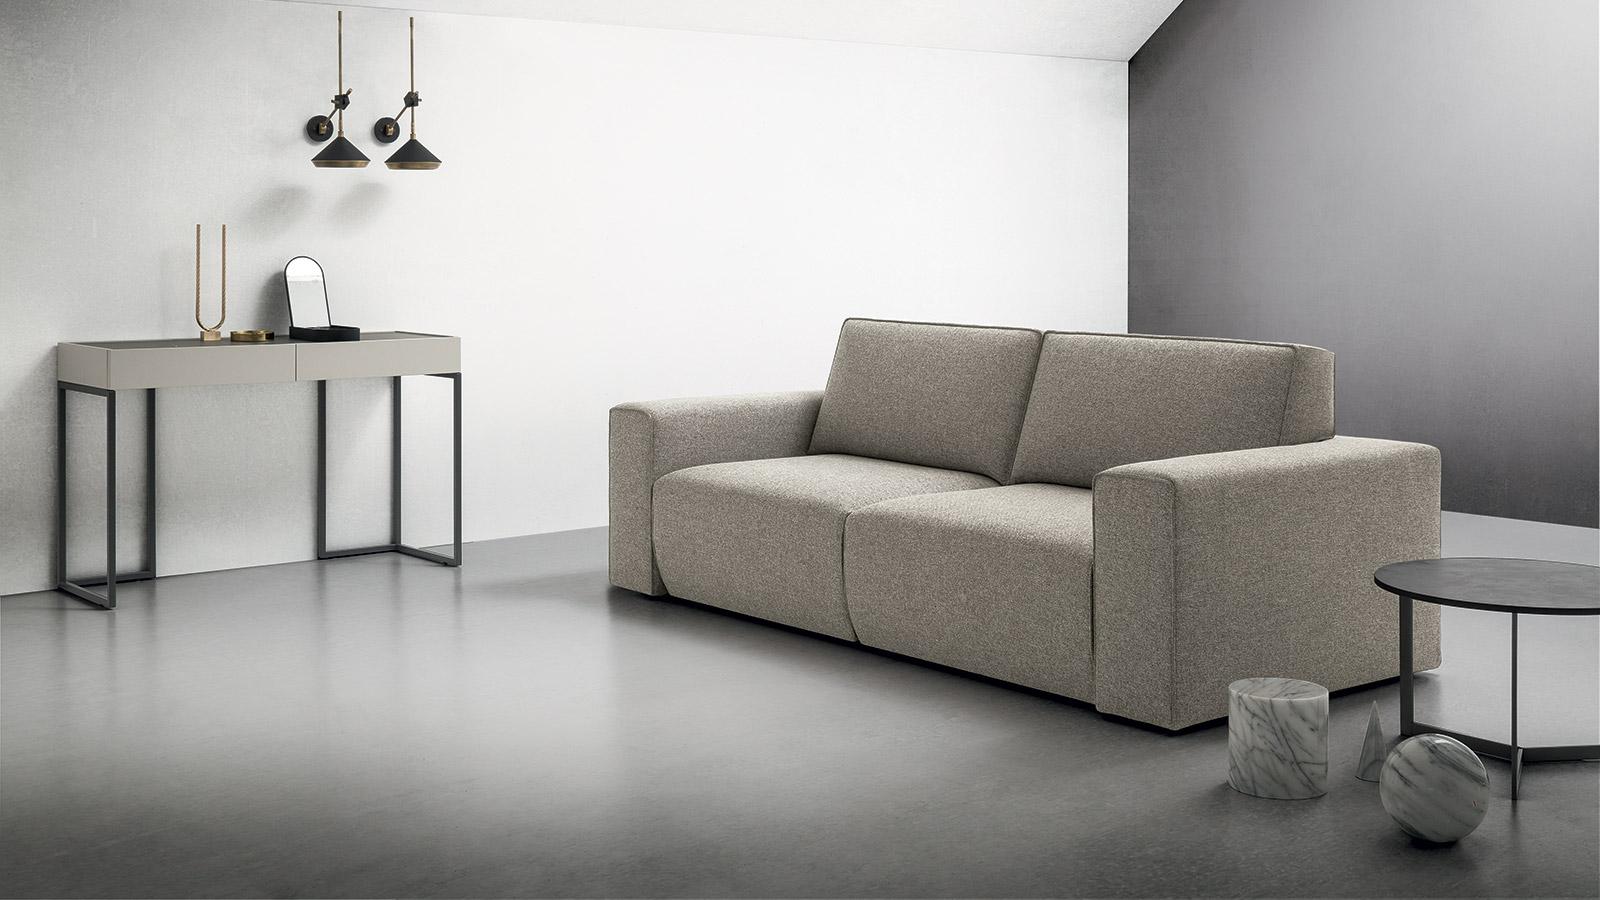 Divano Tessuto Antimacchia Opinioni byron | divani moderni e di design | felis